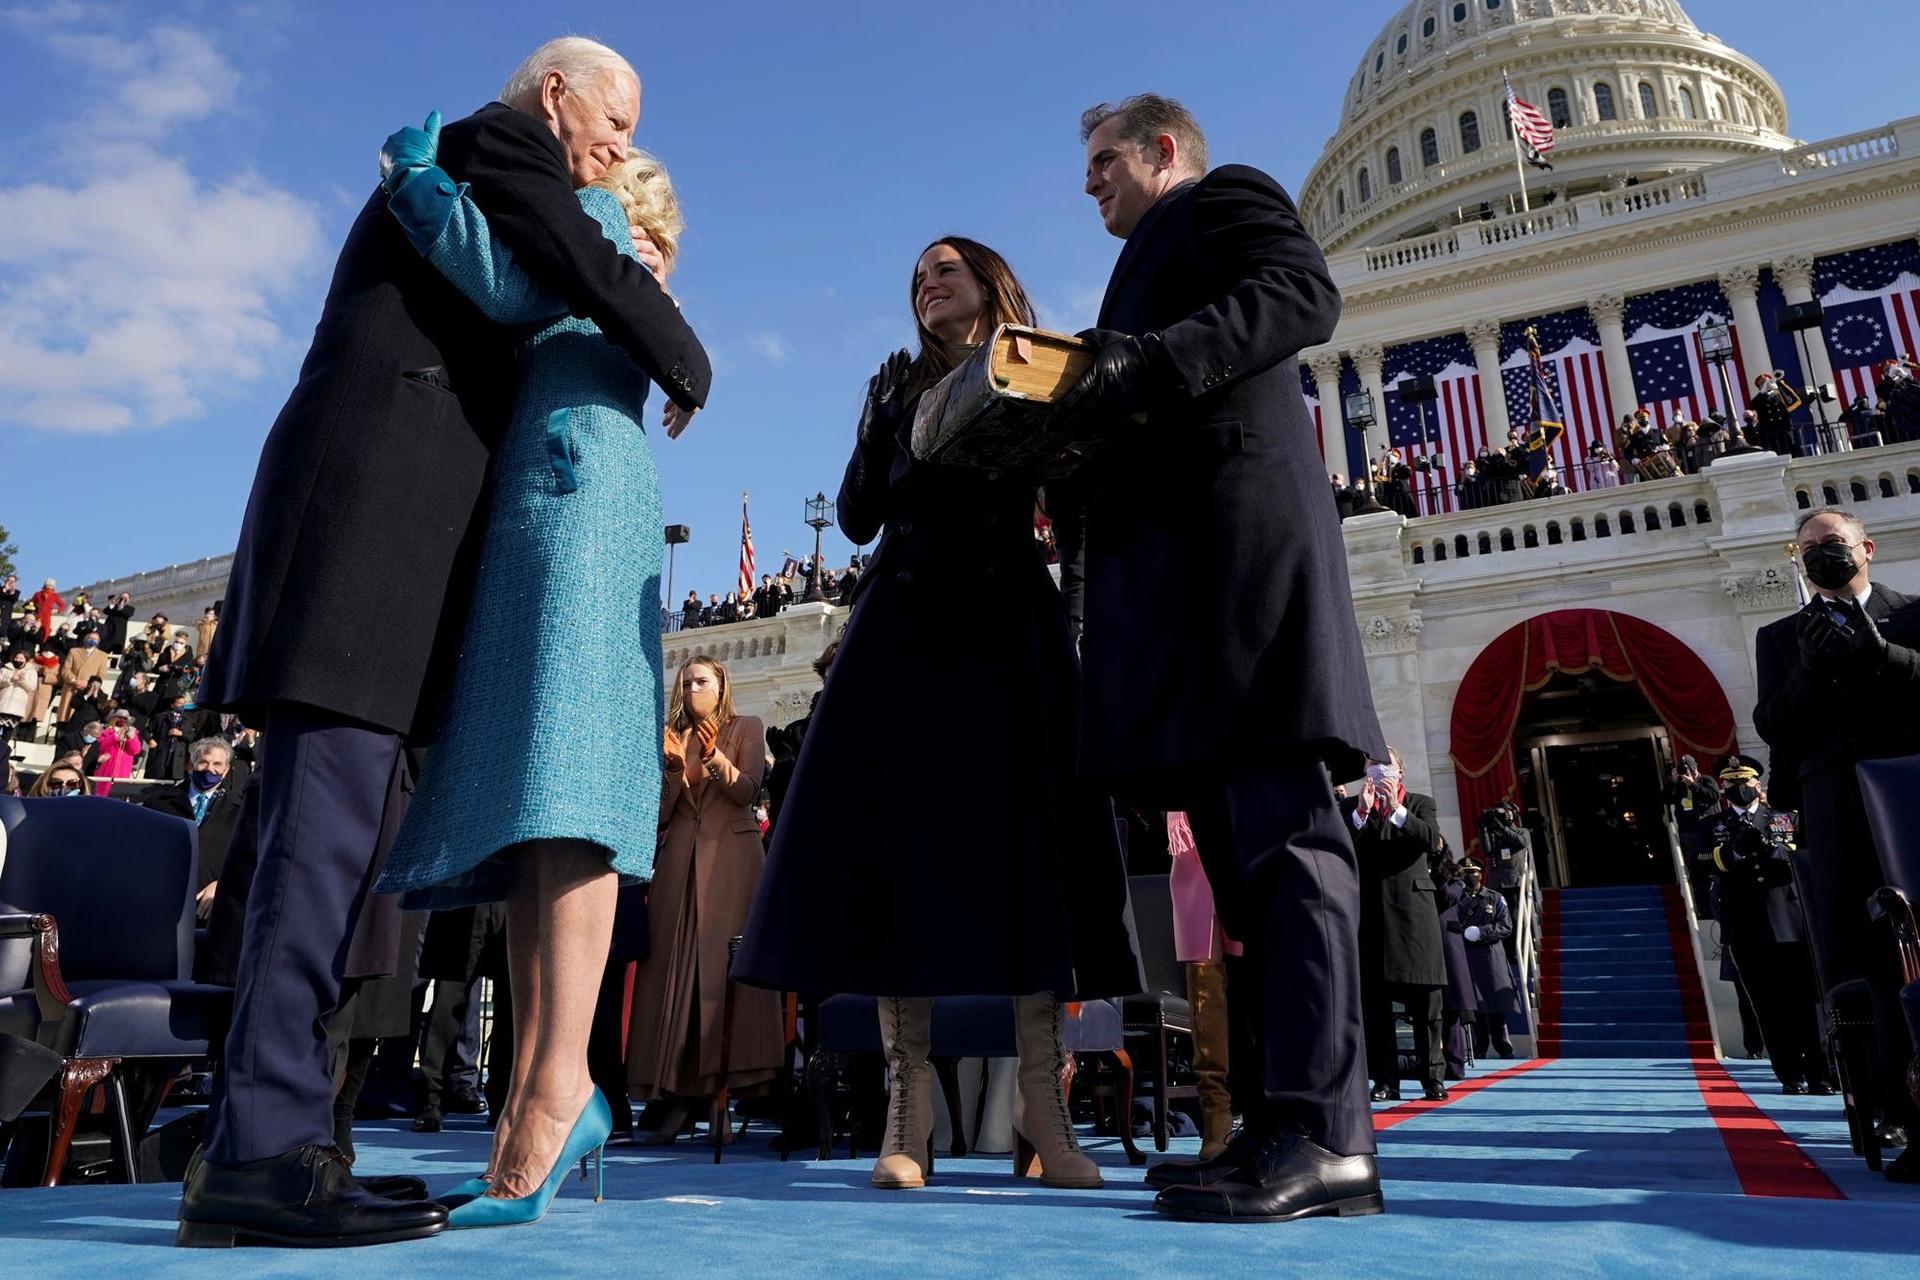 Joe Biden abraza a Jill Biden después de ser juramentado como el 46° presidente de los Estados Unidos